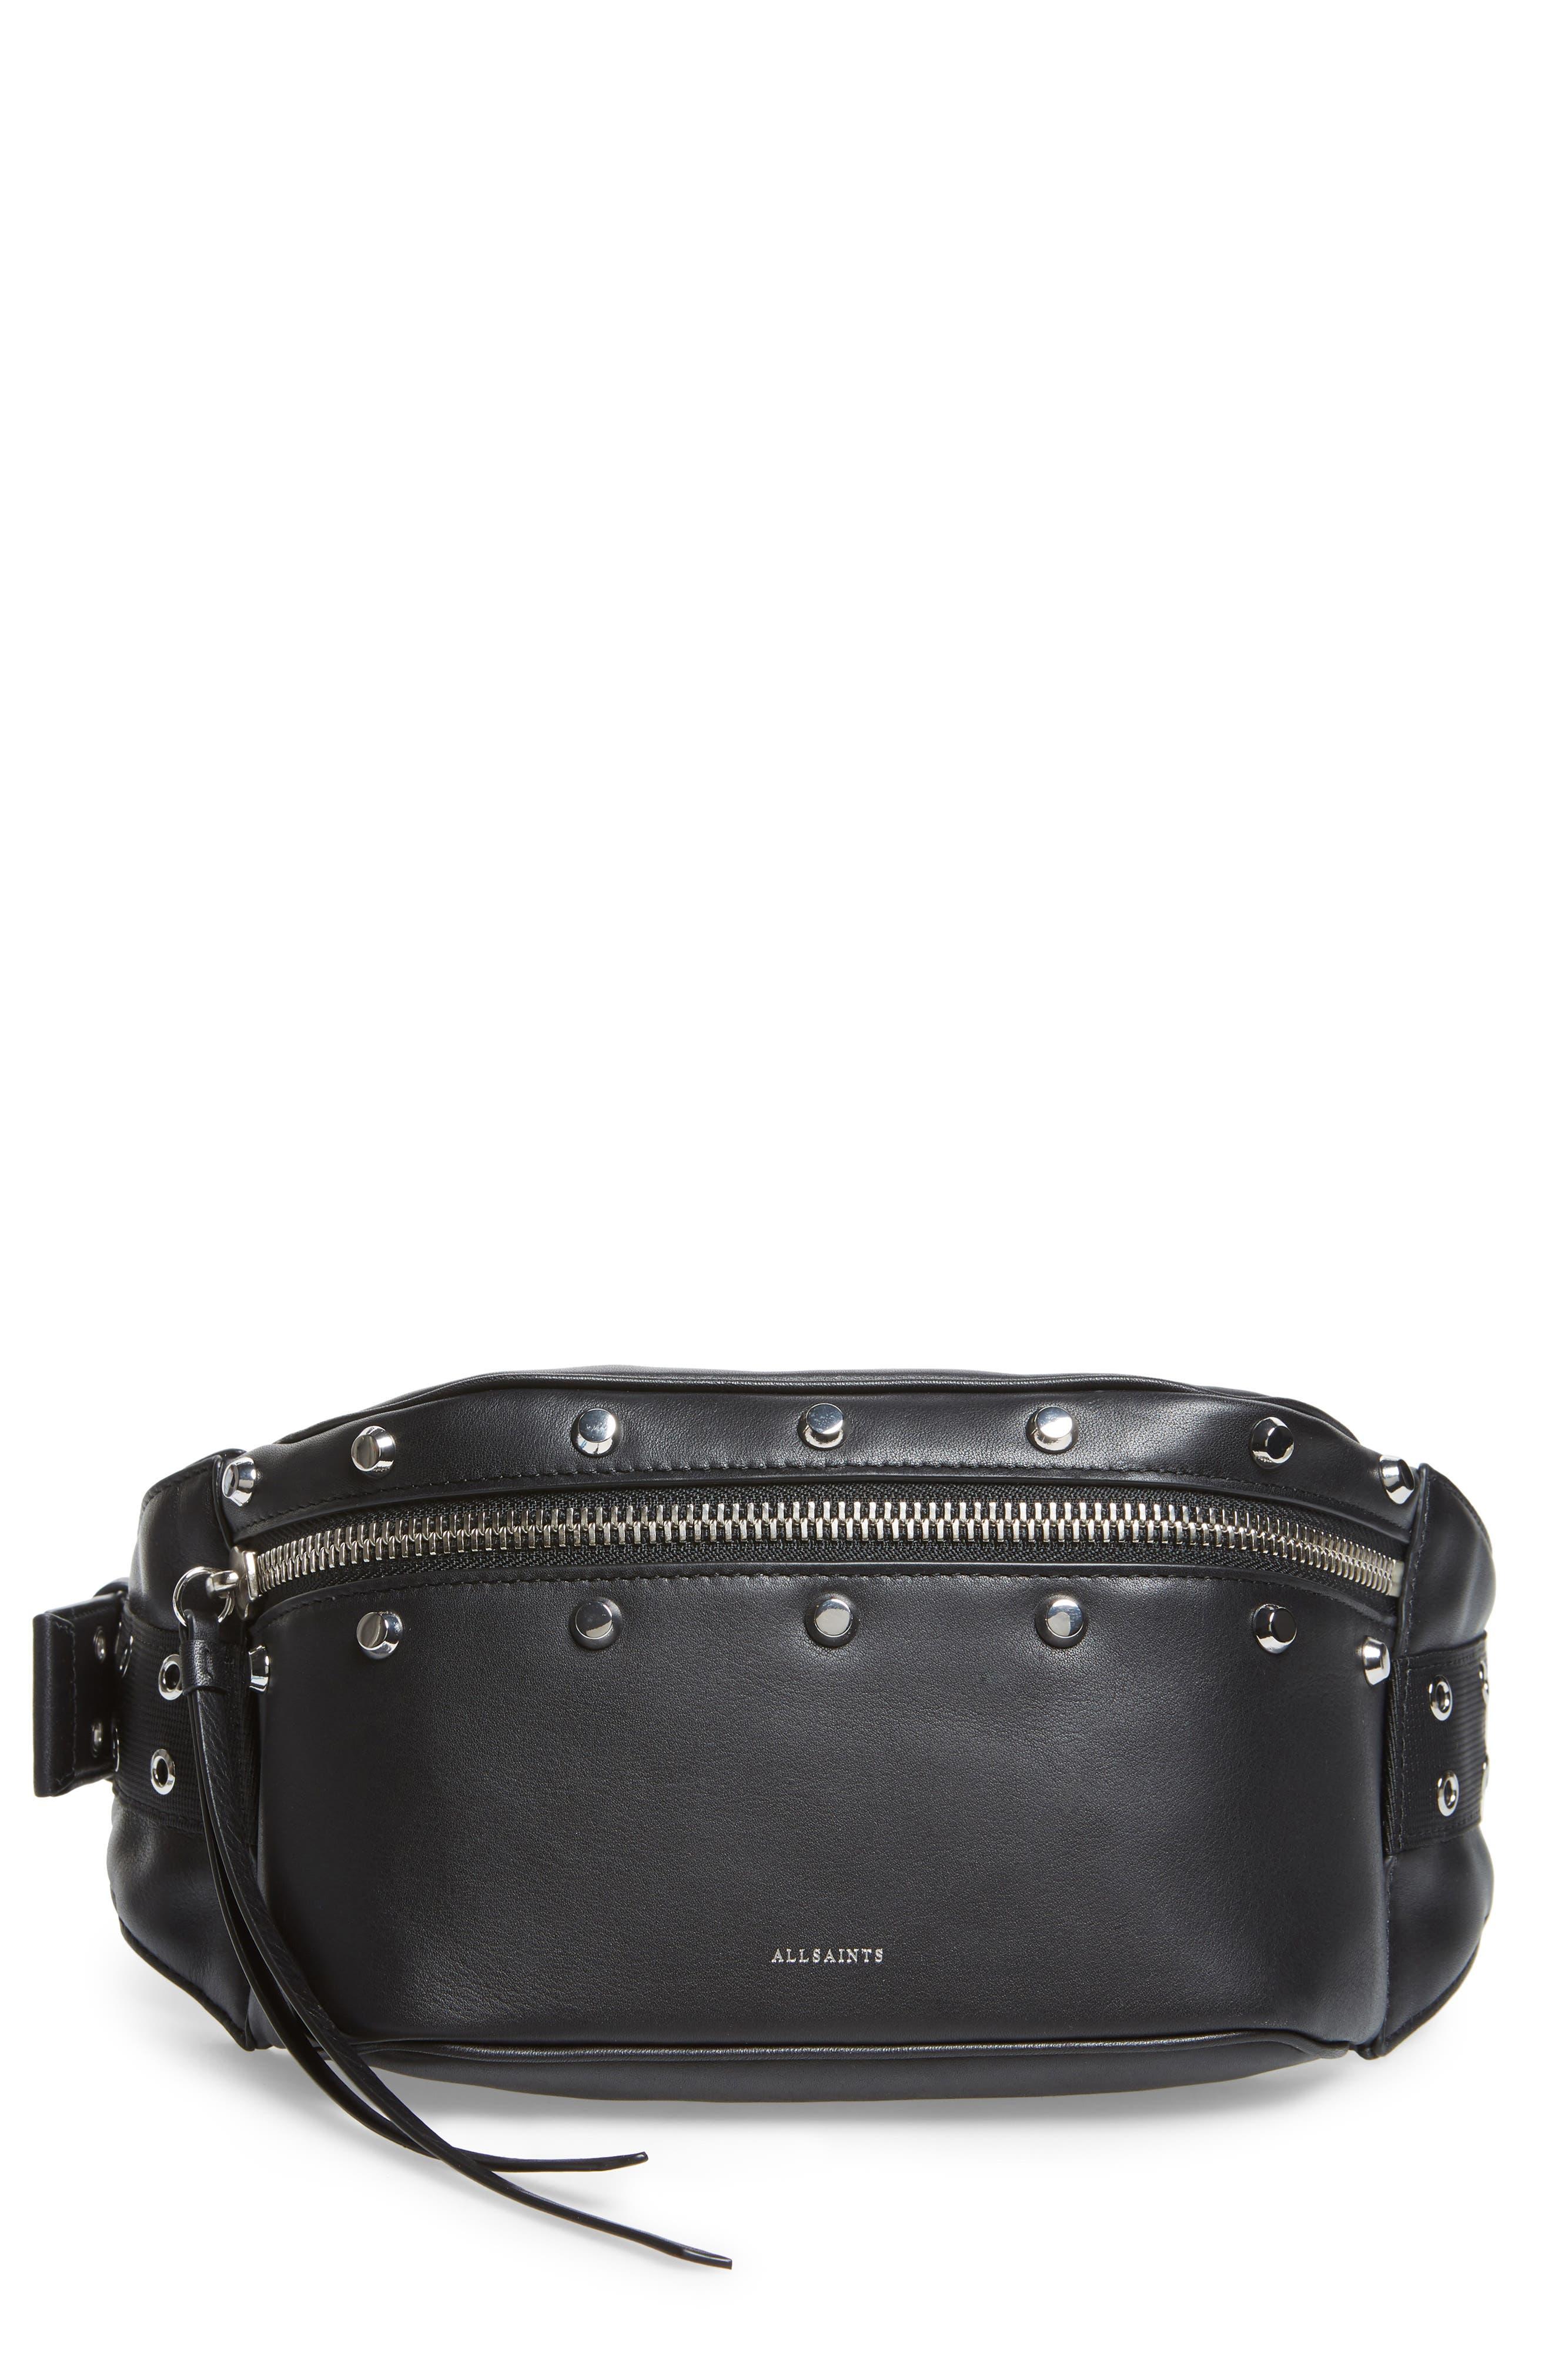 ALLSAINTS, Studded Leather Belt Bag, Main thumbnail 1, color, 001